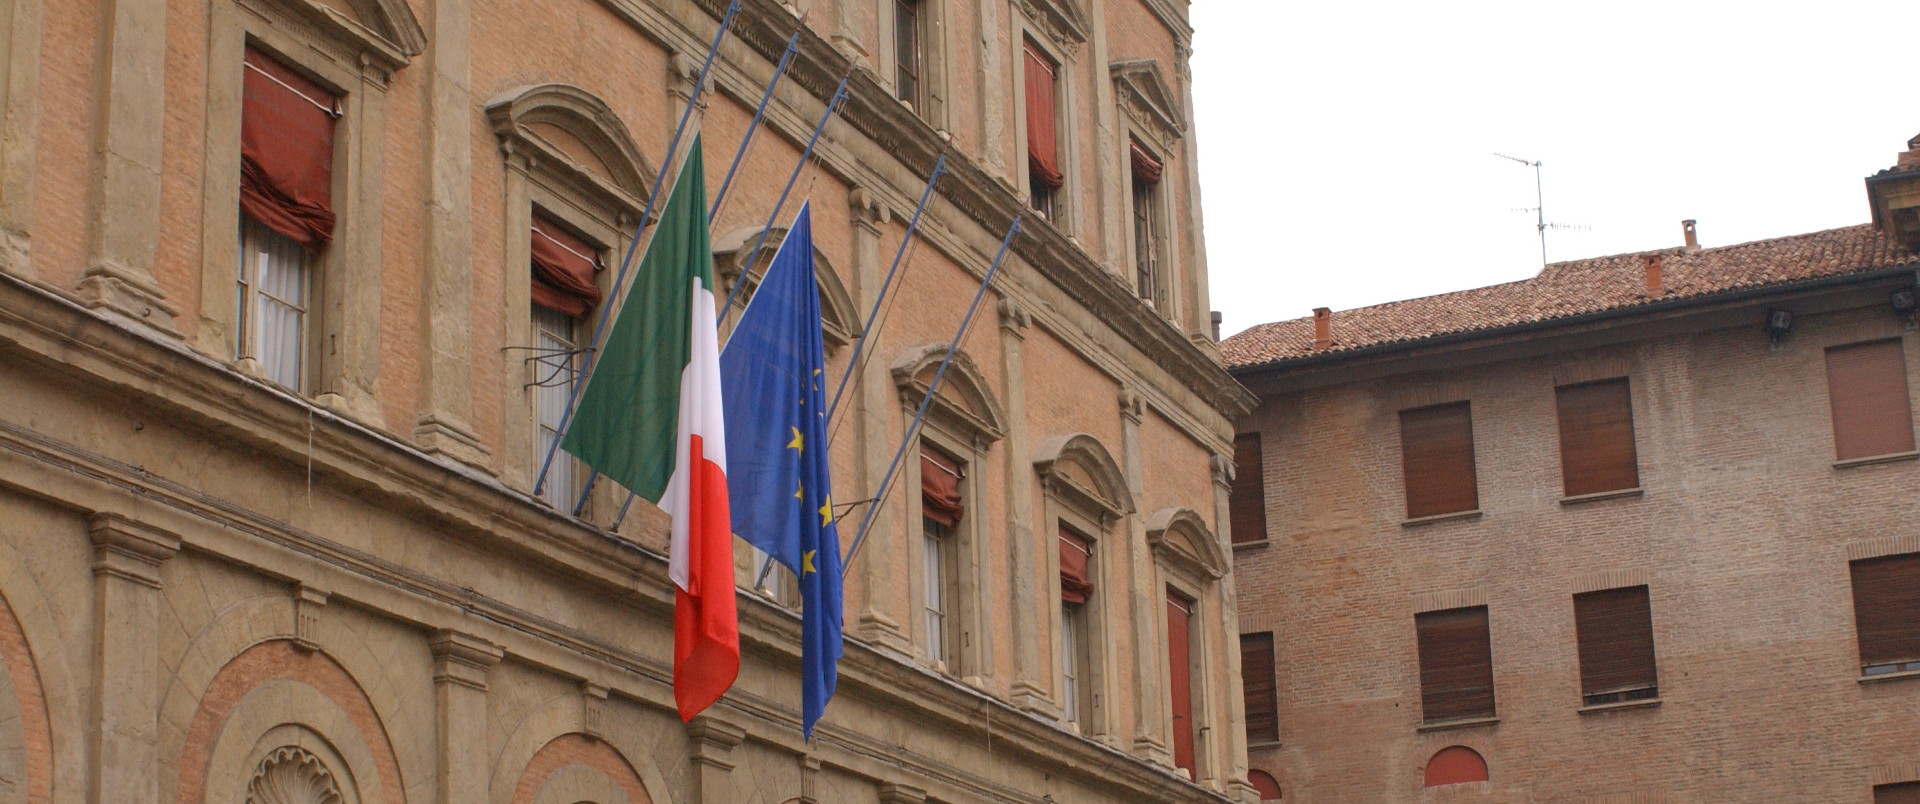 Palazzo Malvezzi De' Medici